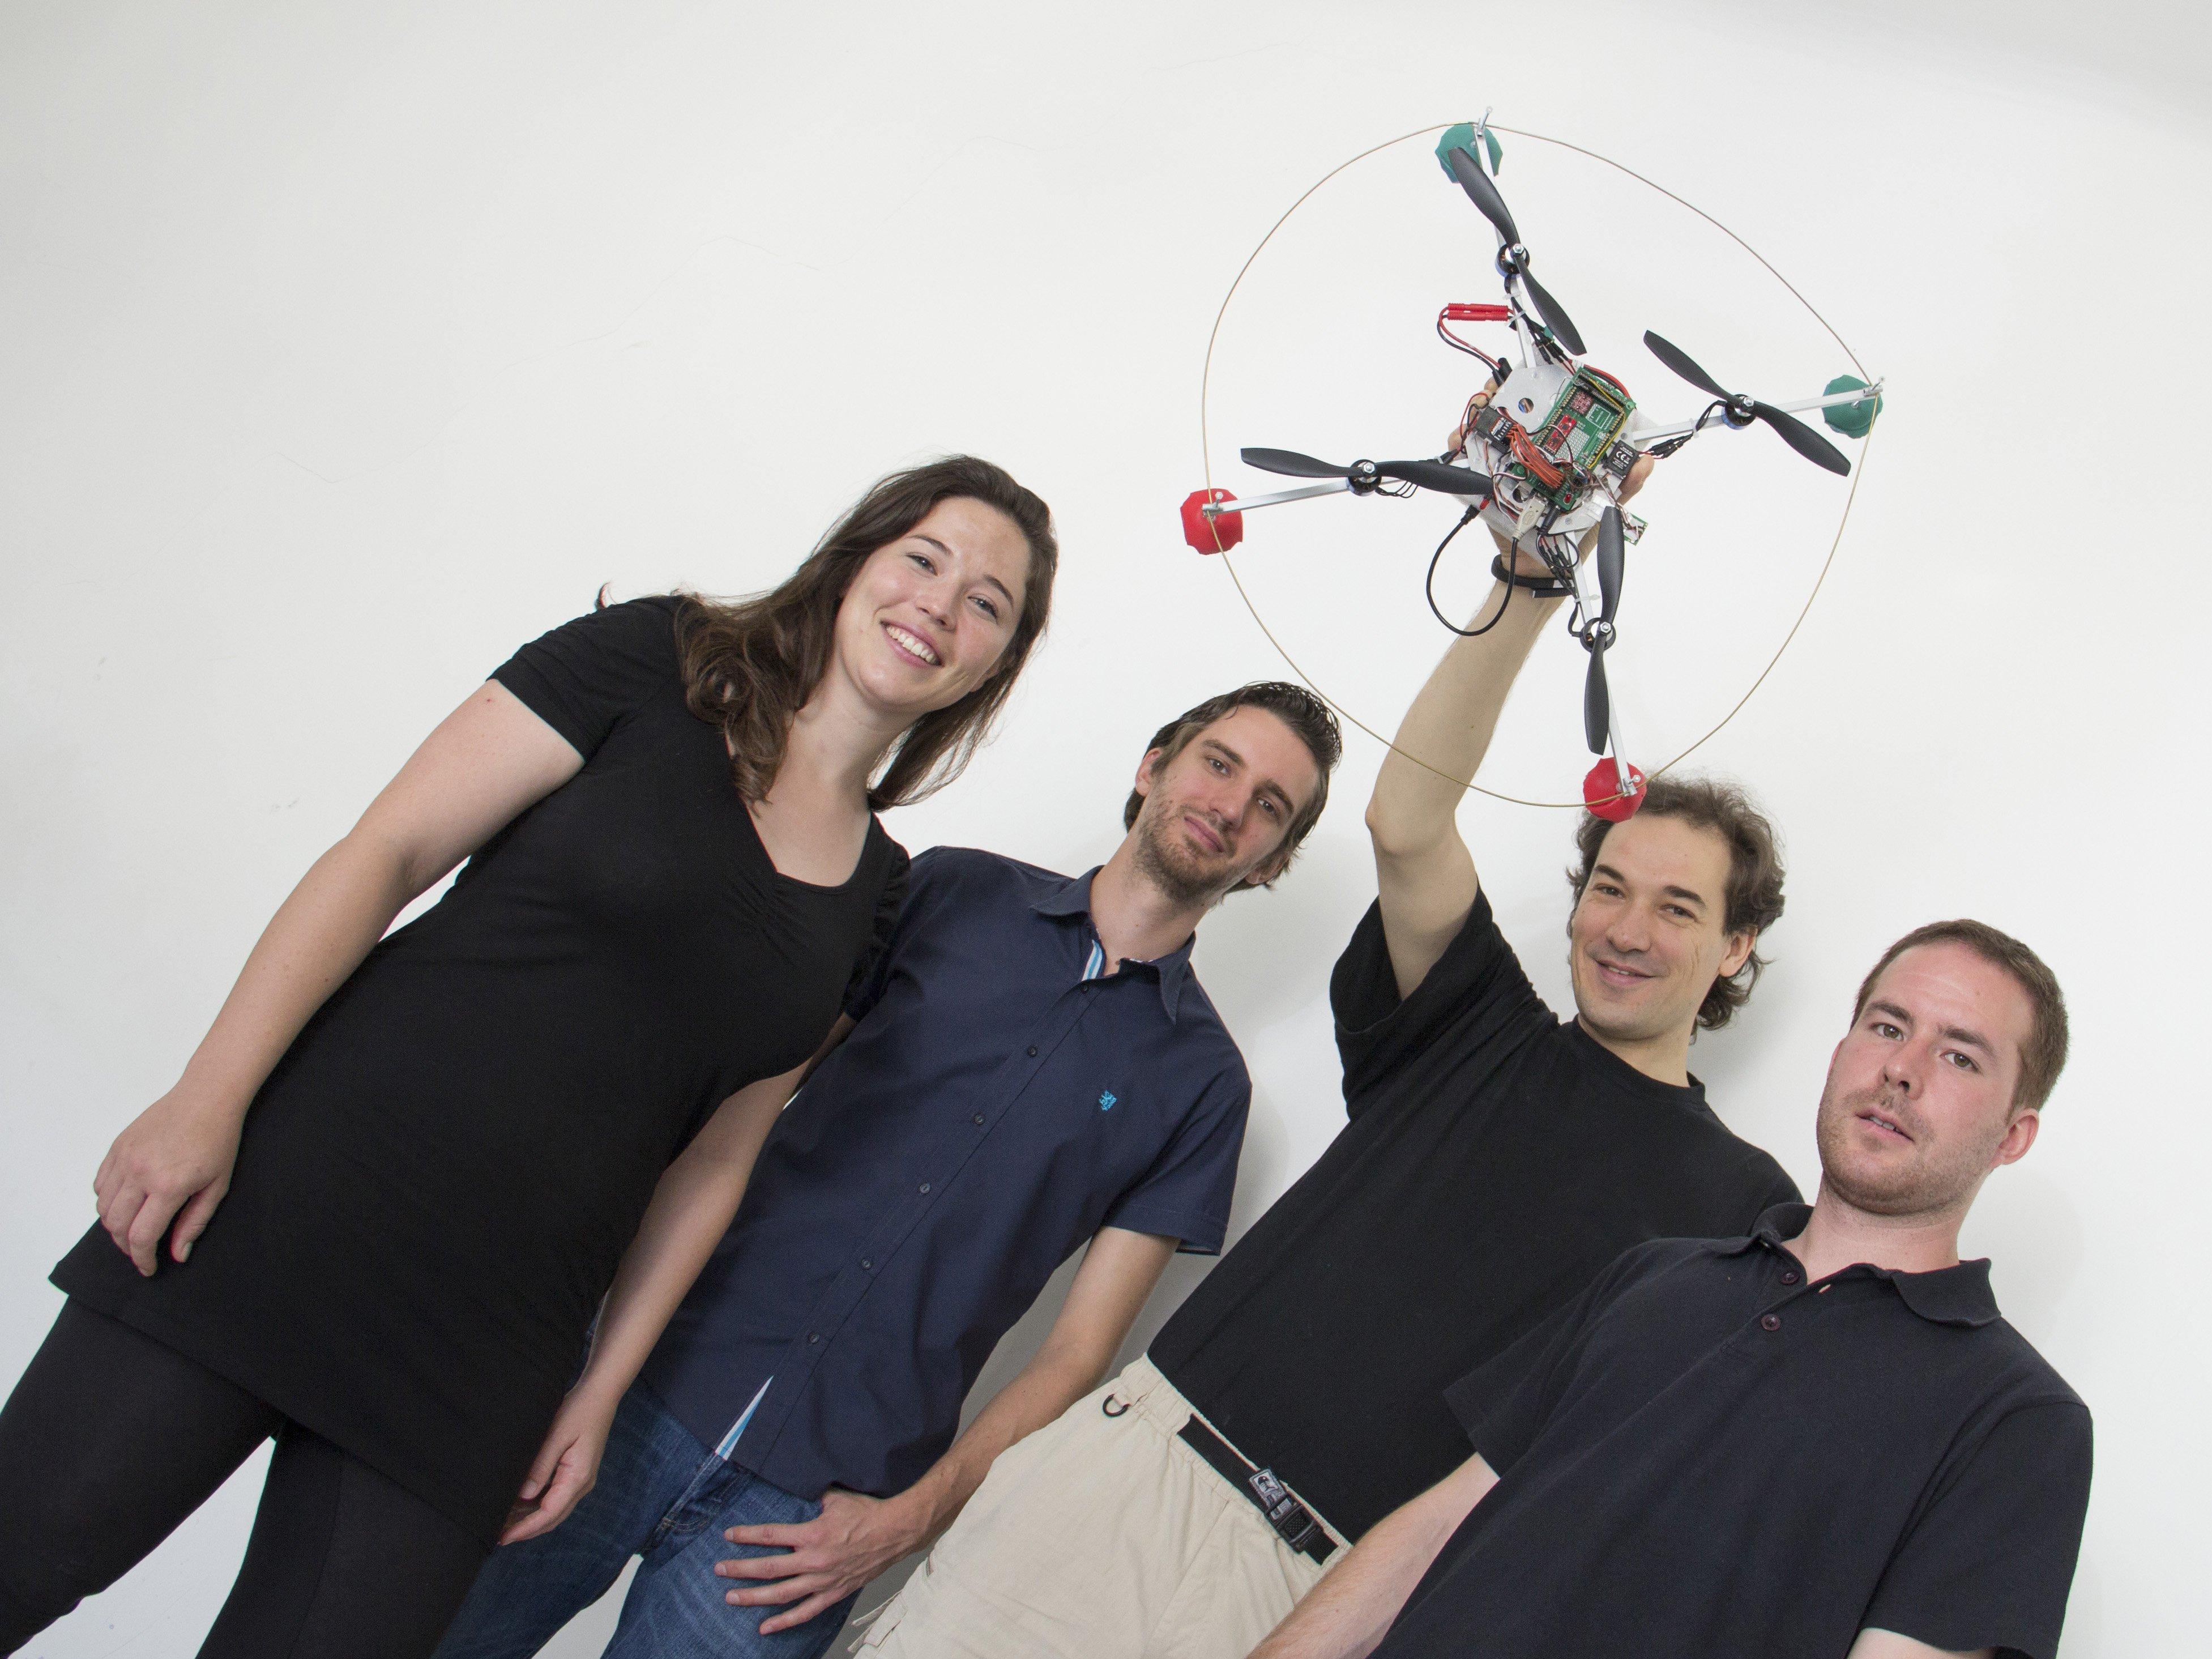 Das Quadcopter-Team: Annette Mossel, Christoph Kaltenriner, Hannes Kaufmann, Michael Leichtfried (v.l.n.r.).